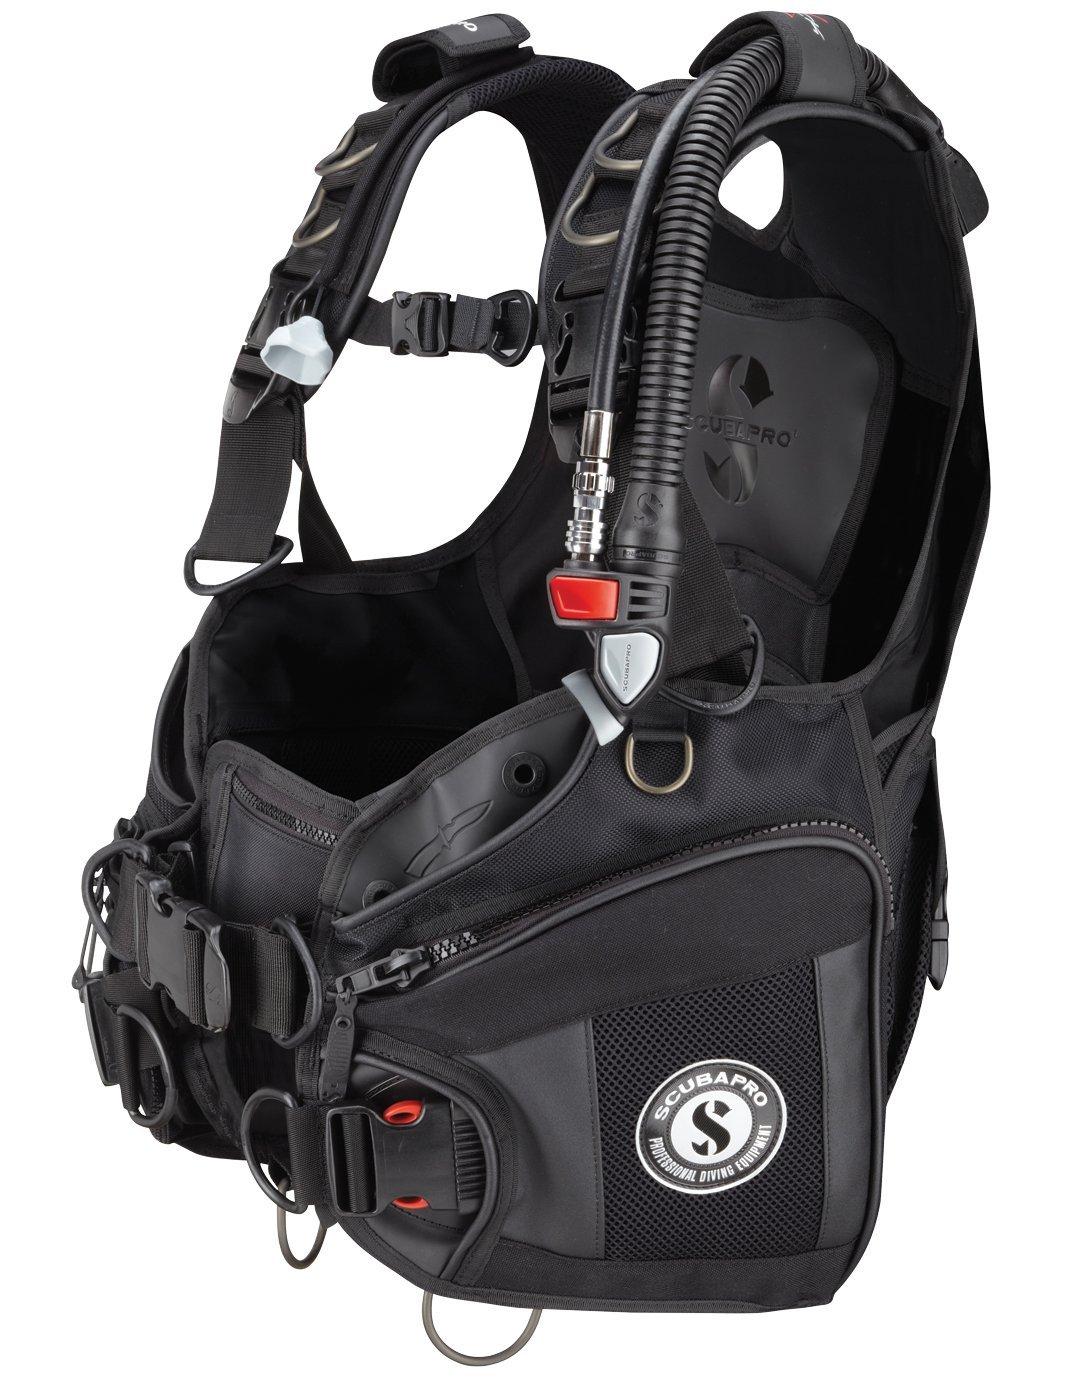 ScubaPro X-Black V Gen BCD with Air2, Black